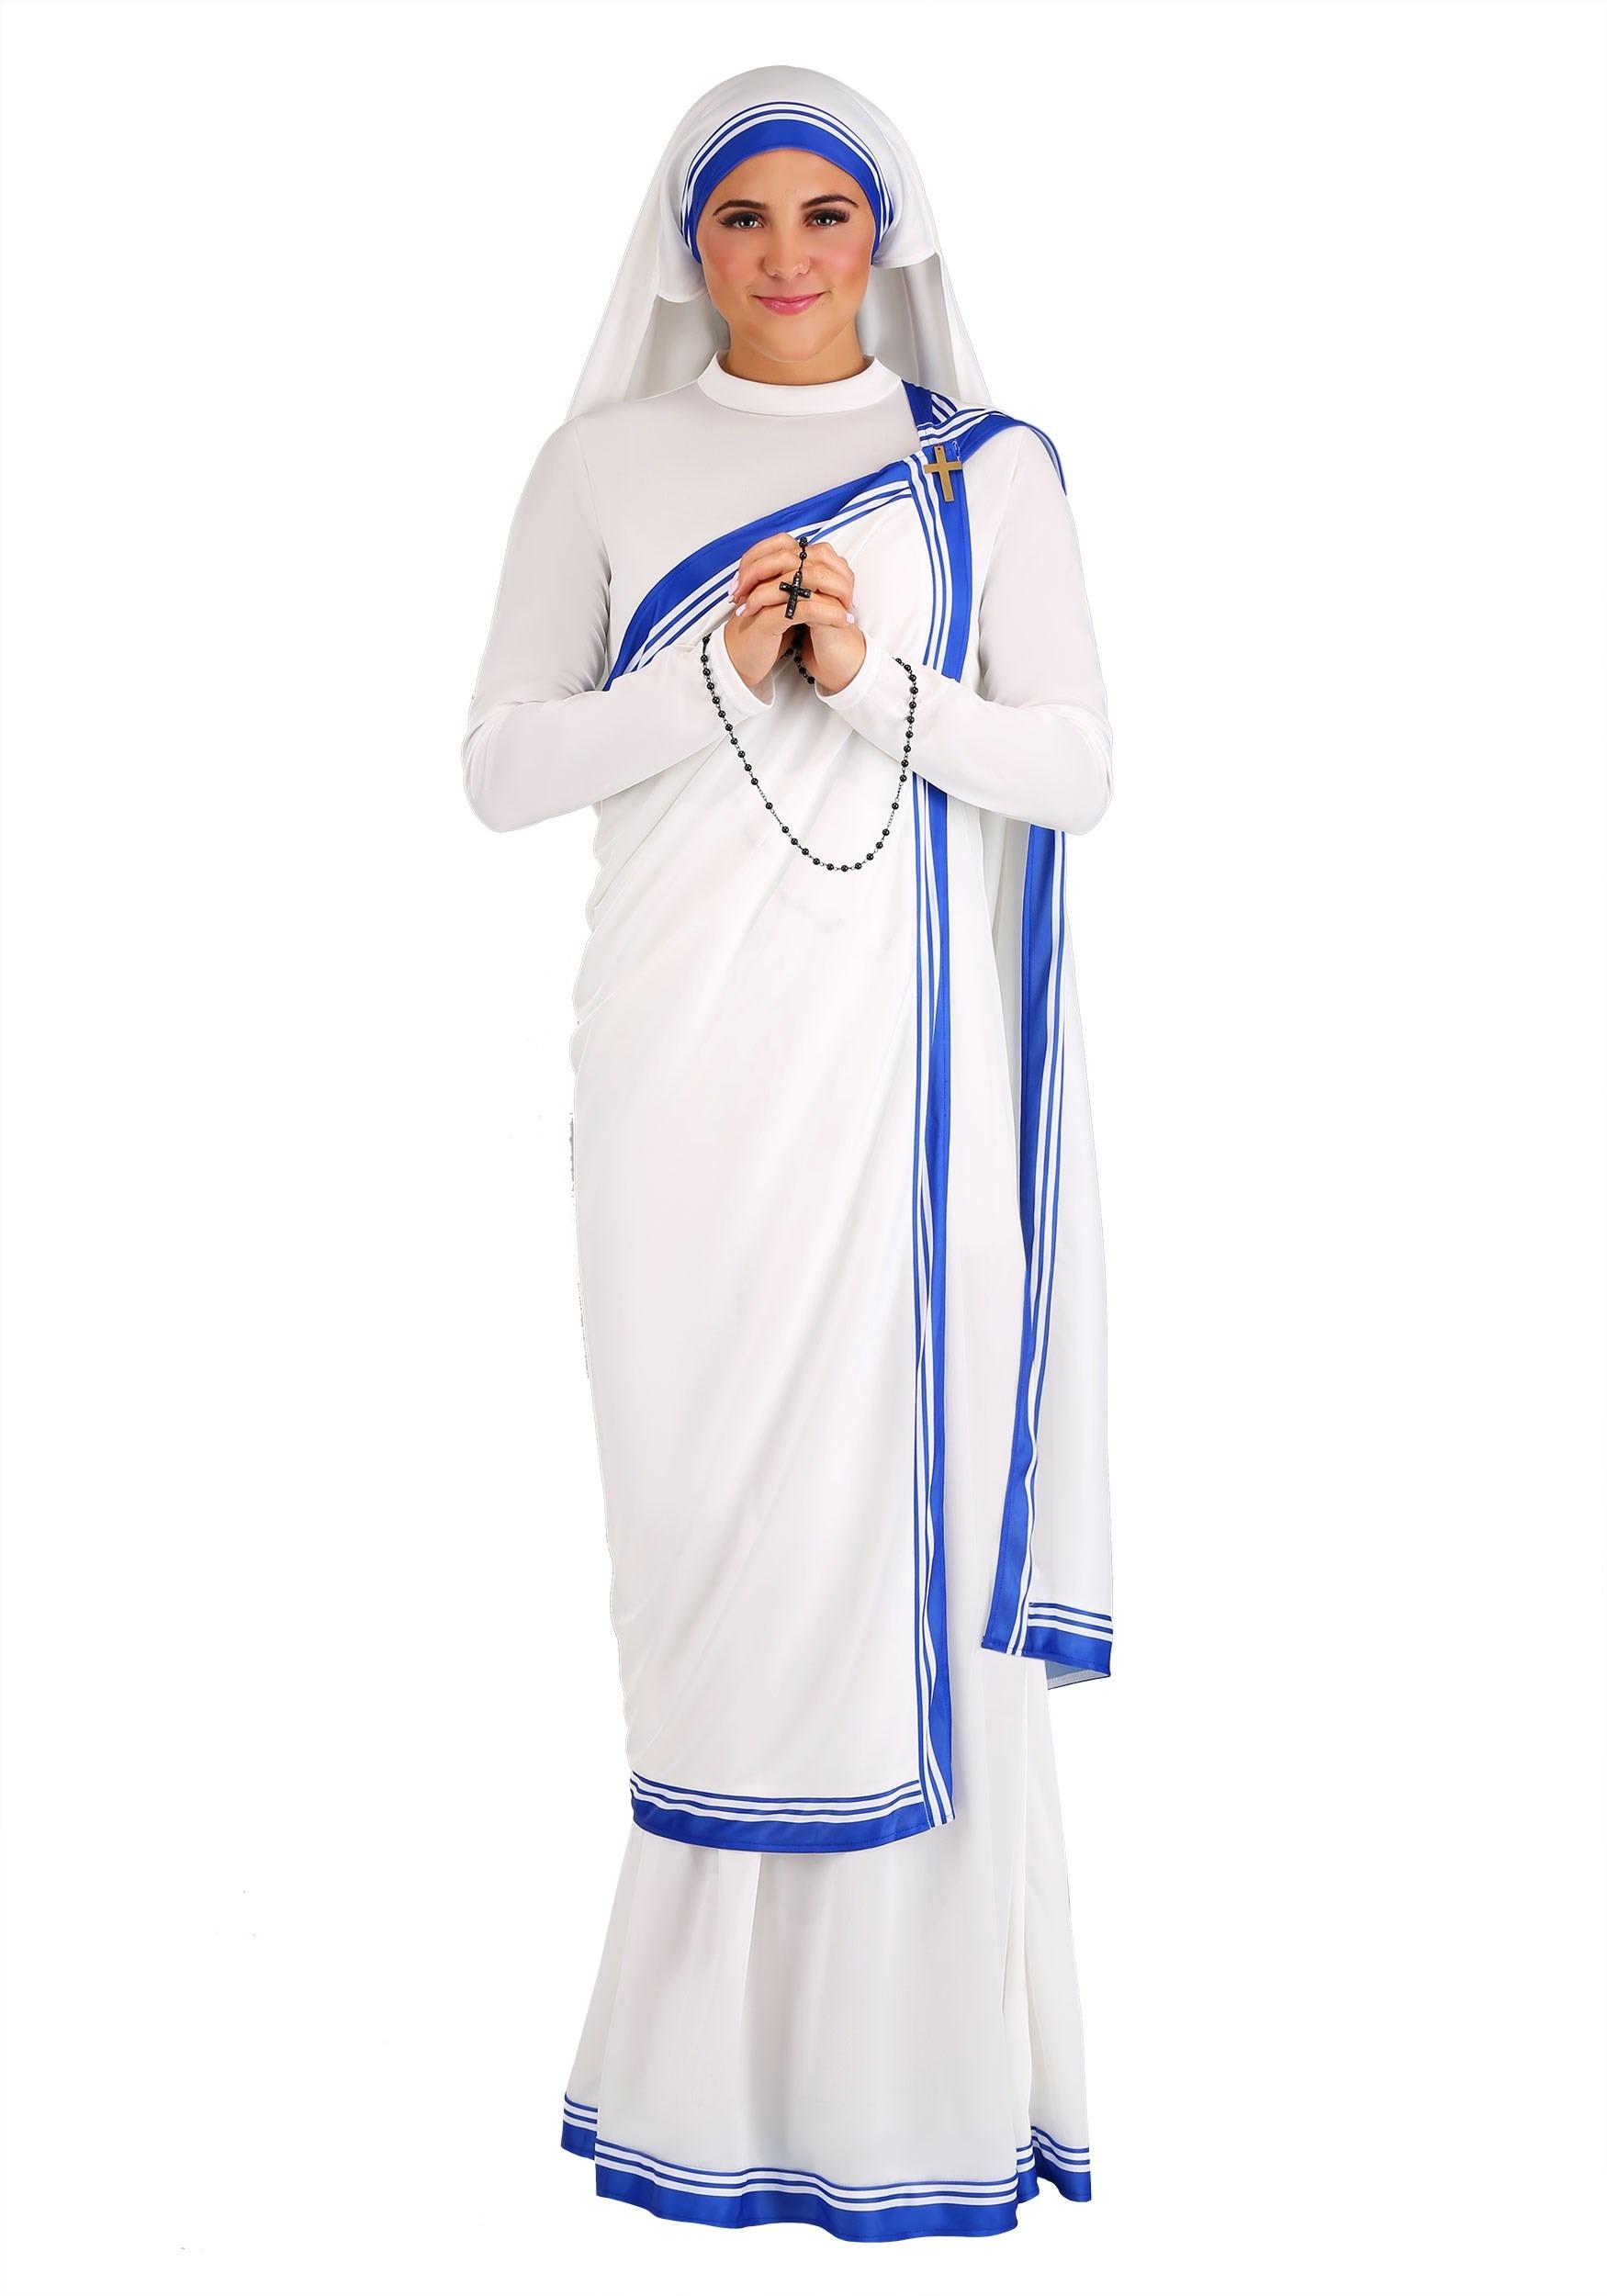 Saint Mother Teresa Crew Socks NEW